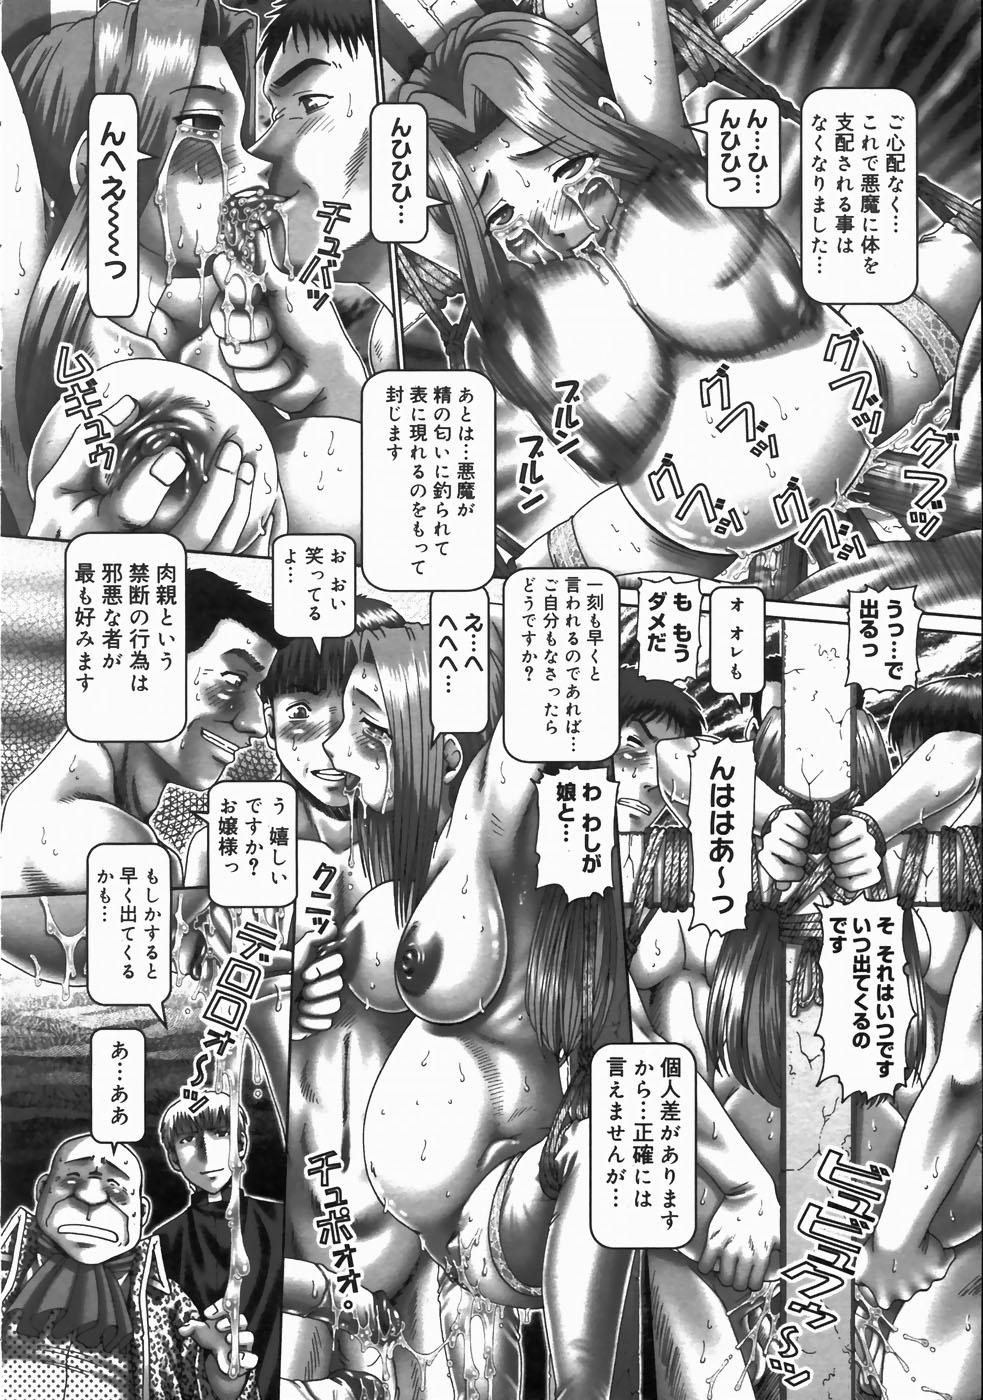 COMIC Megastore H 2003-07 47